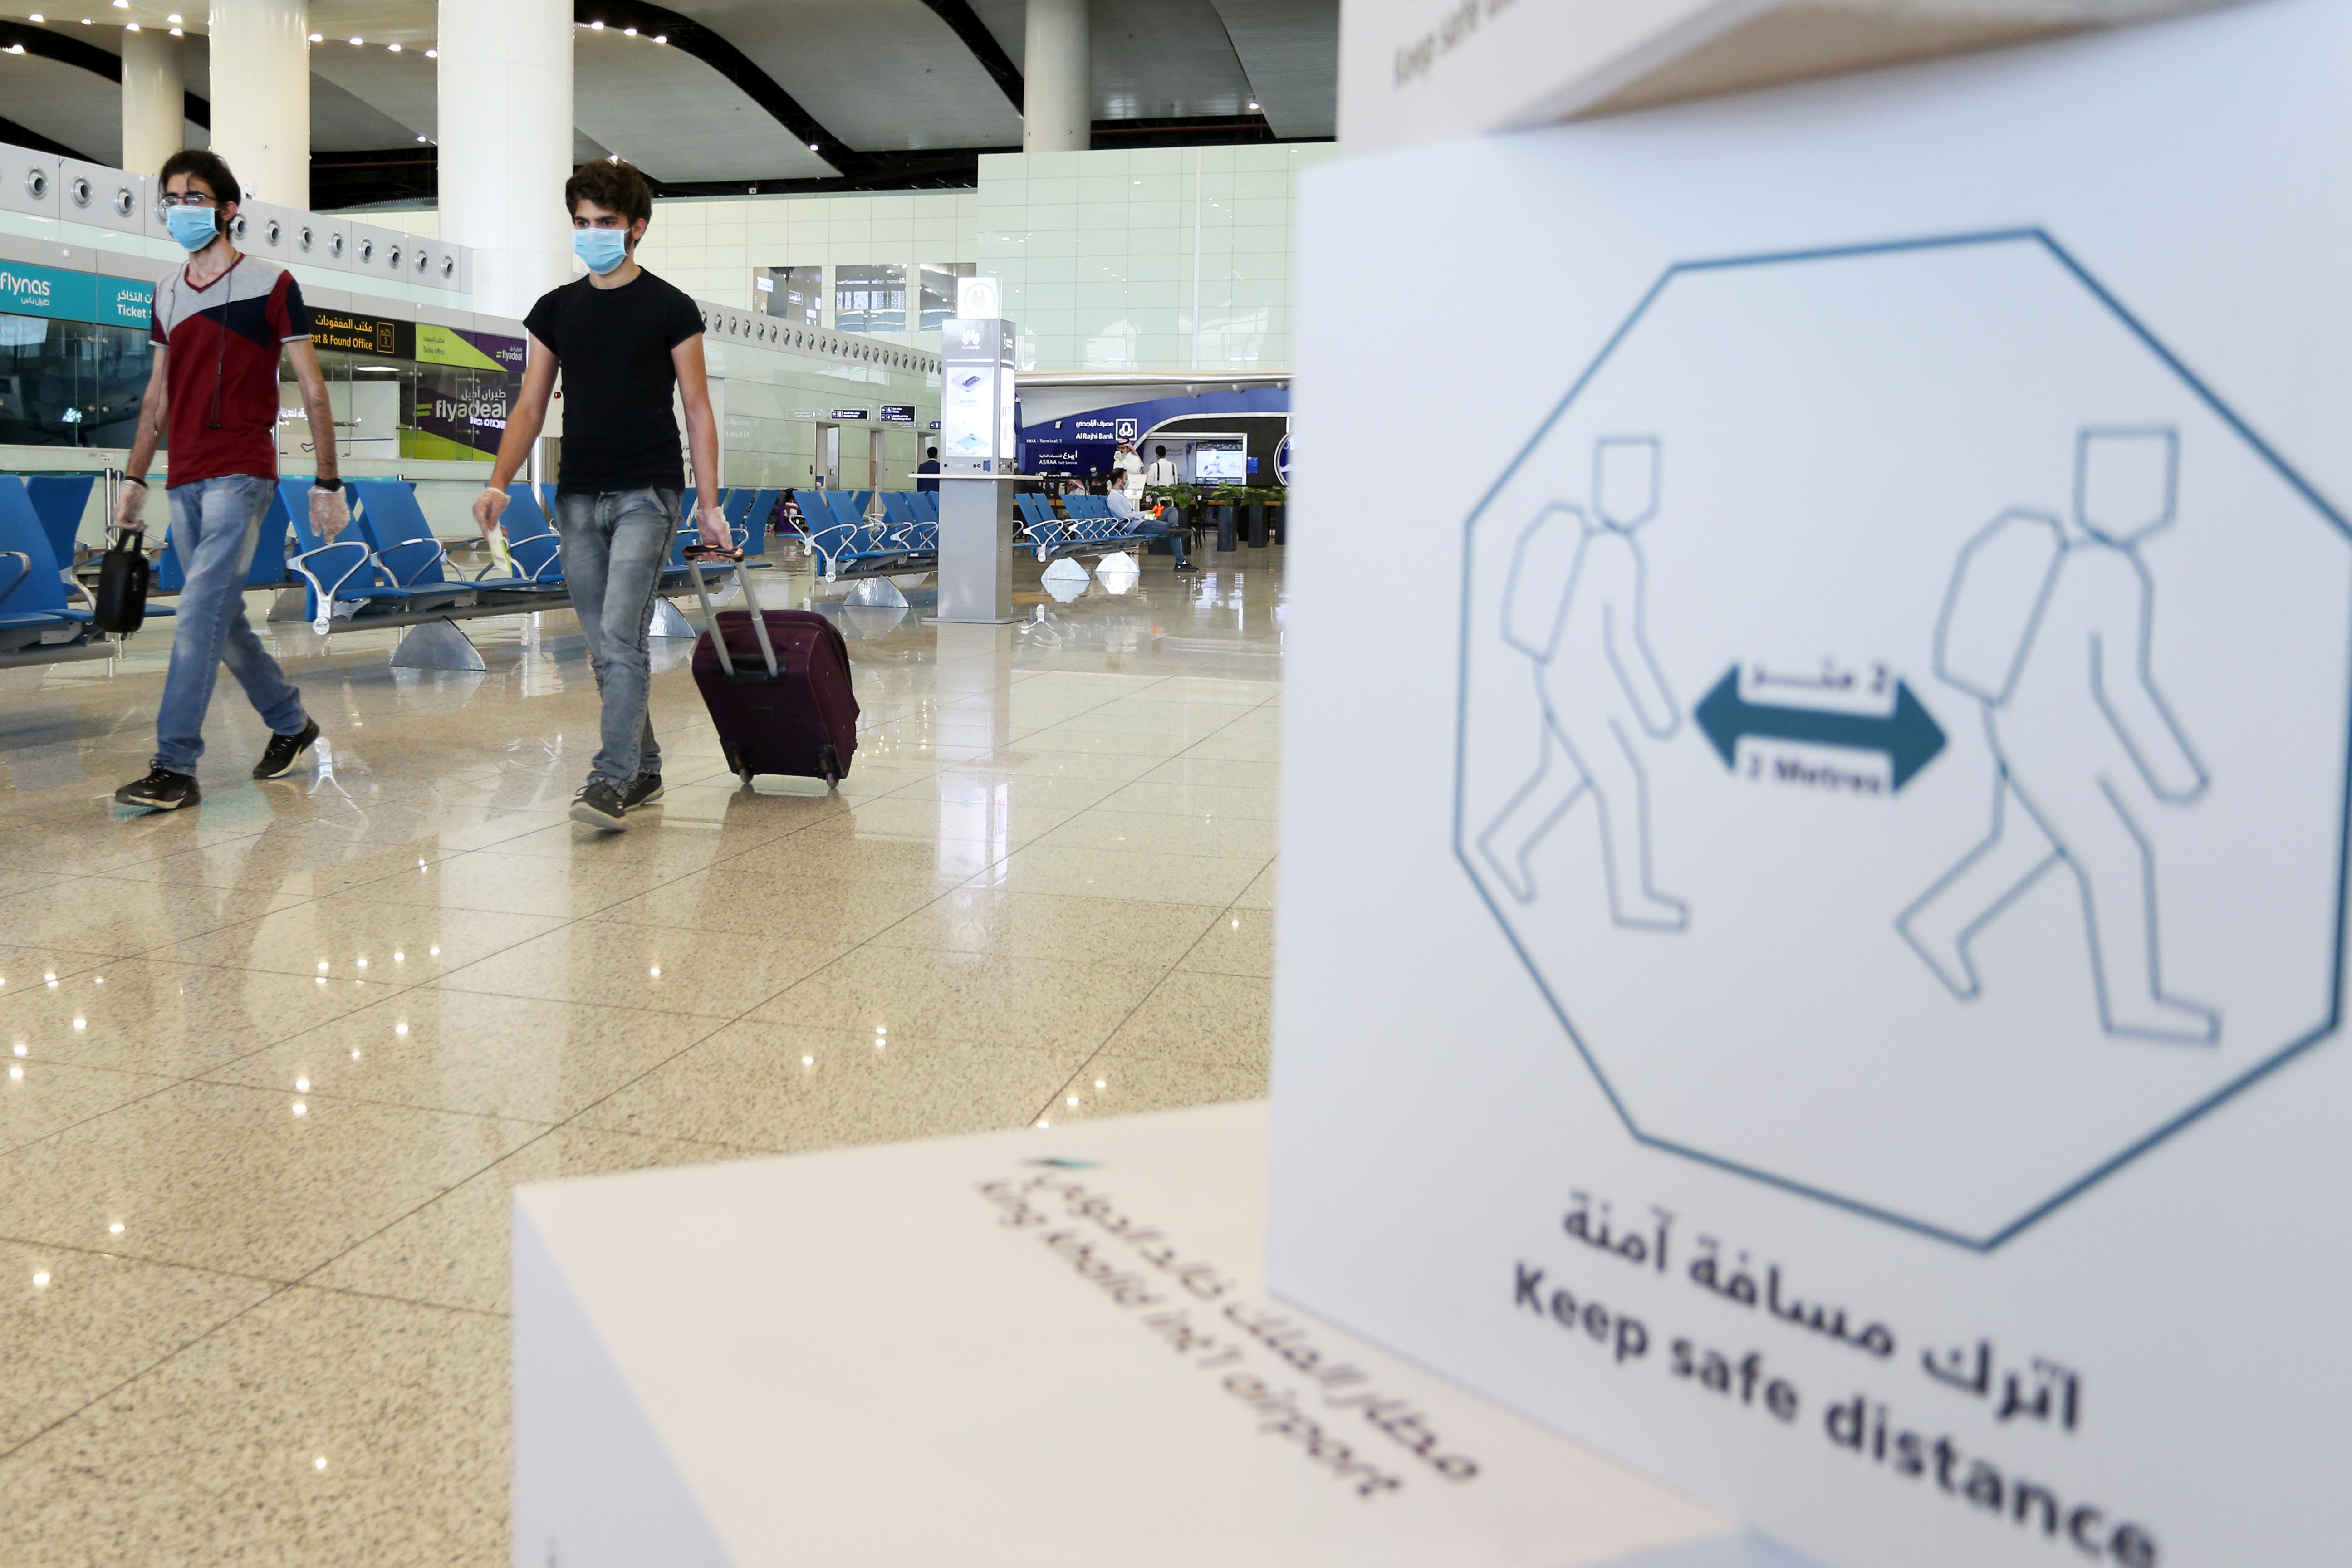 Travellers wearing protective face masks walk at Riyadh International Airport, after Saudi Arabia reopened domestic flights, following the outbreak of the coronavirus disease (COVID-19), in Riyadh, Saudi Arabia May 31, 2020. REUTERS/Ahmed Yosri